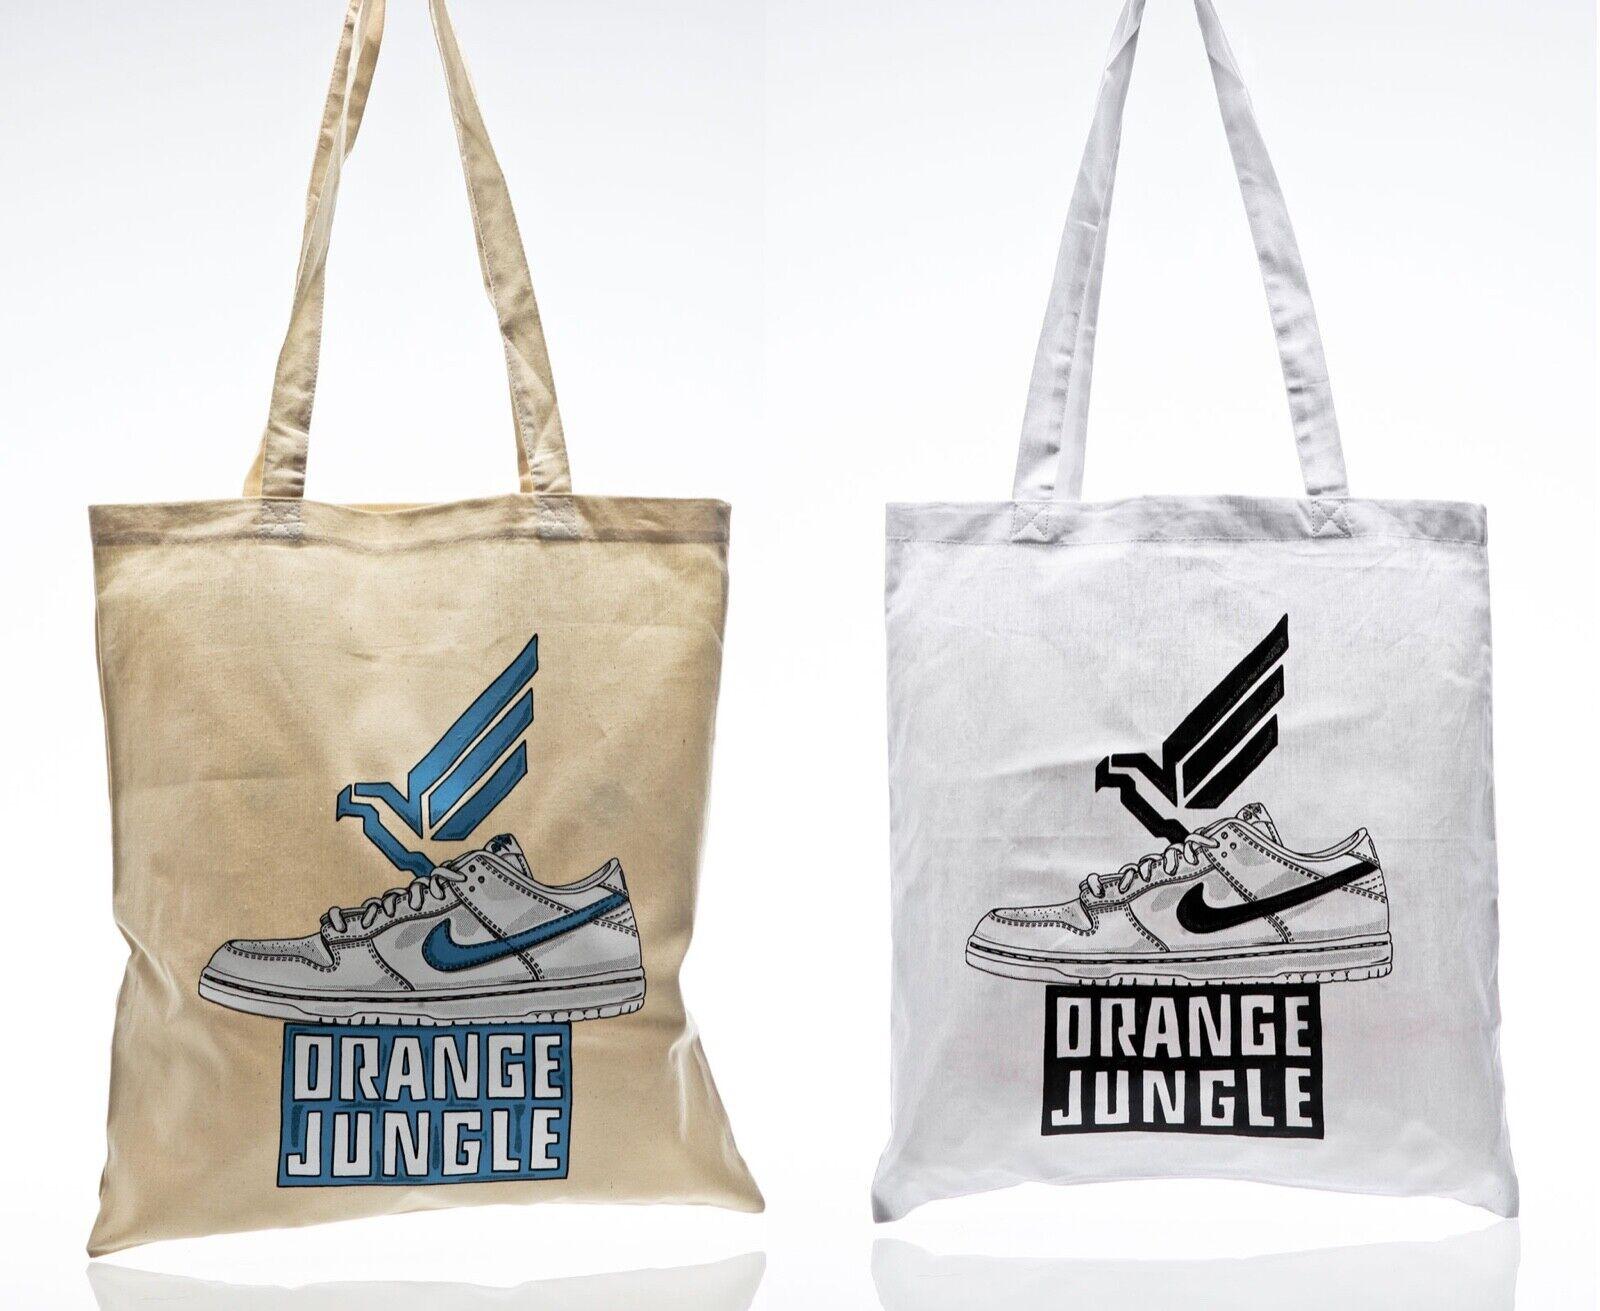 Orange Jungle SB Dunk Bag Mulder White Cream Jute Bag Tote Bag